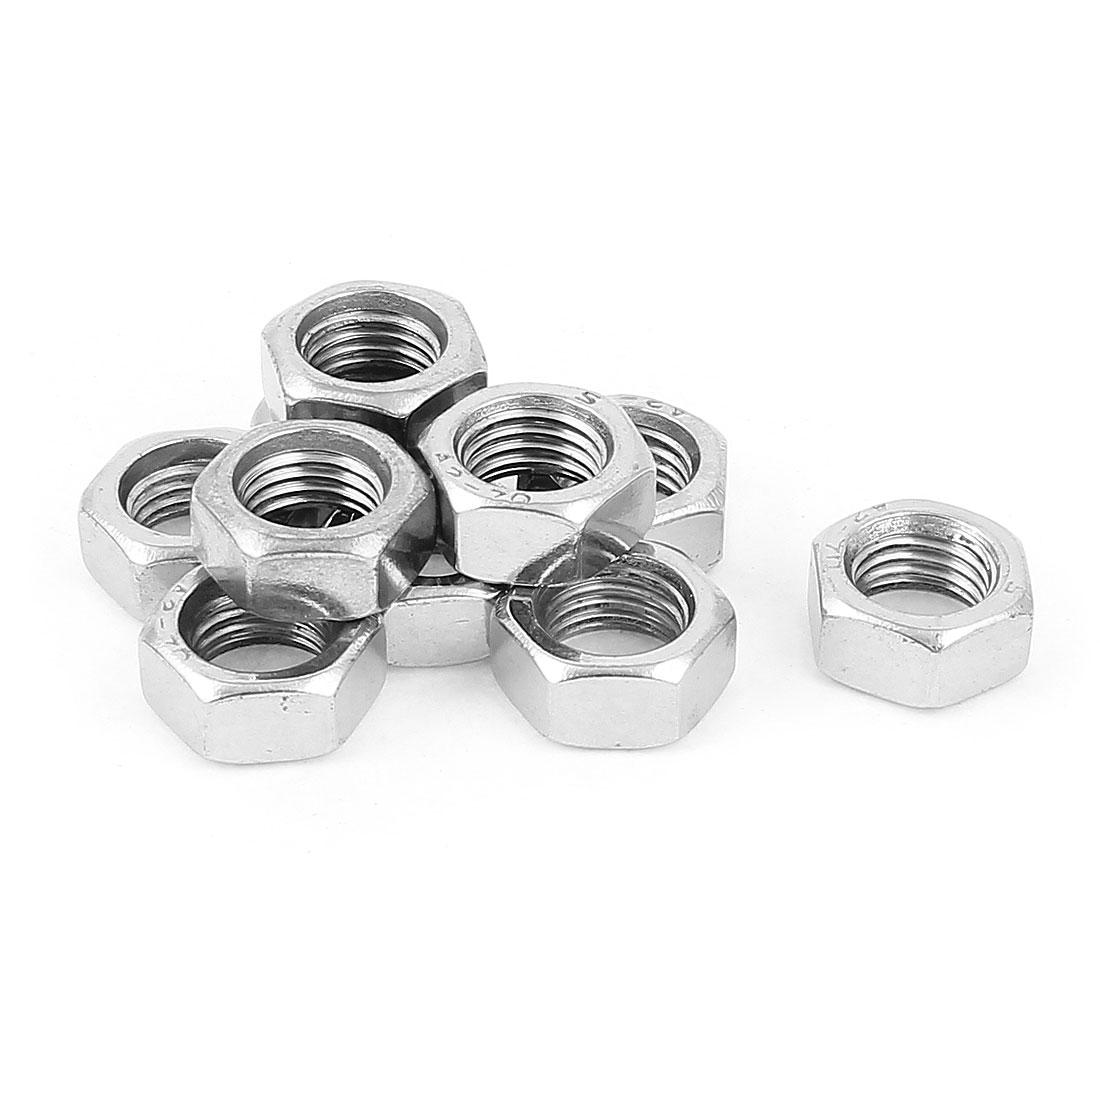 Machine Screw Stainless Steel M16 Thread Hex Lock Nut Silver Tone 10pcs